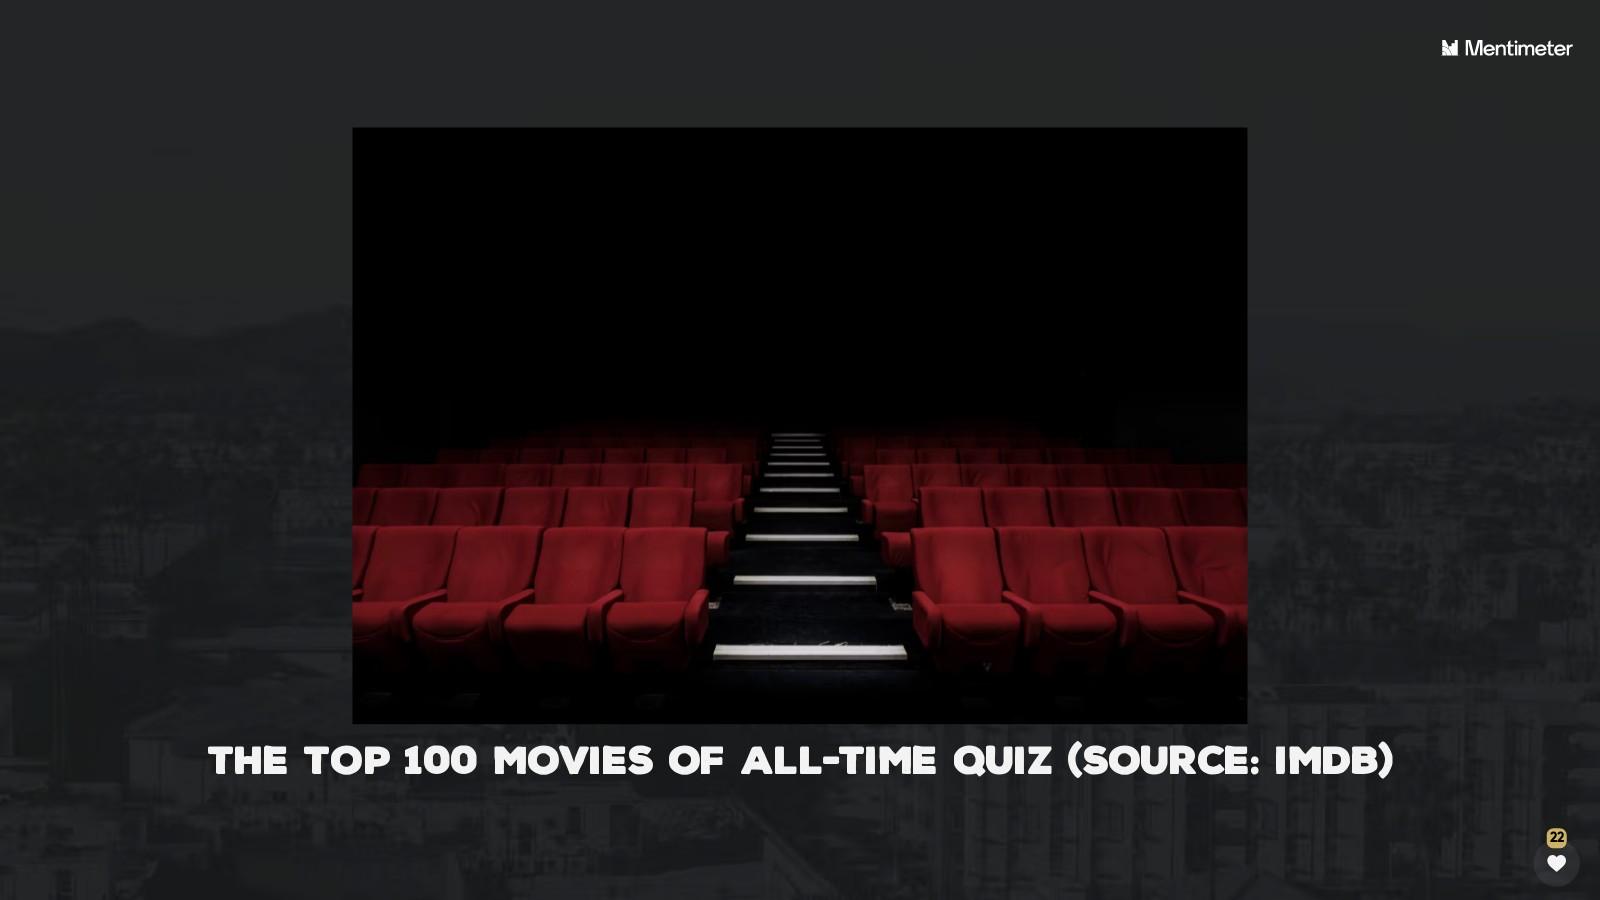 The Top 100 Movies Quiz